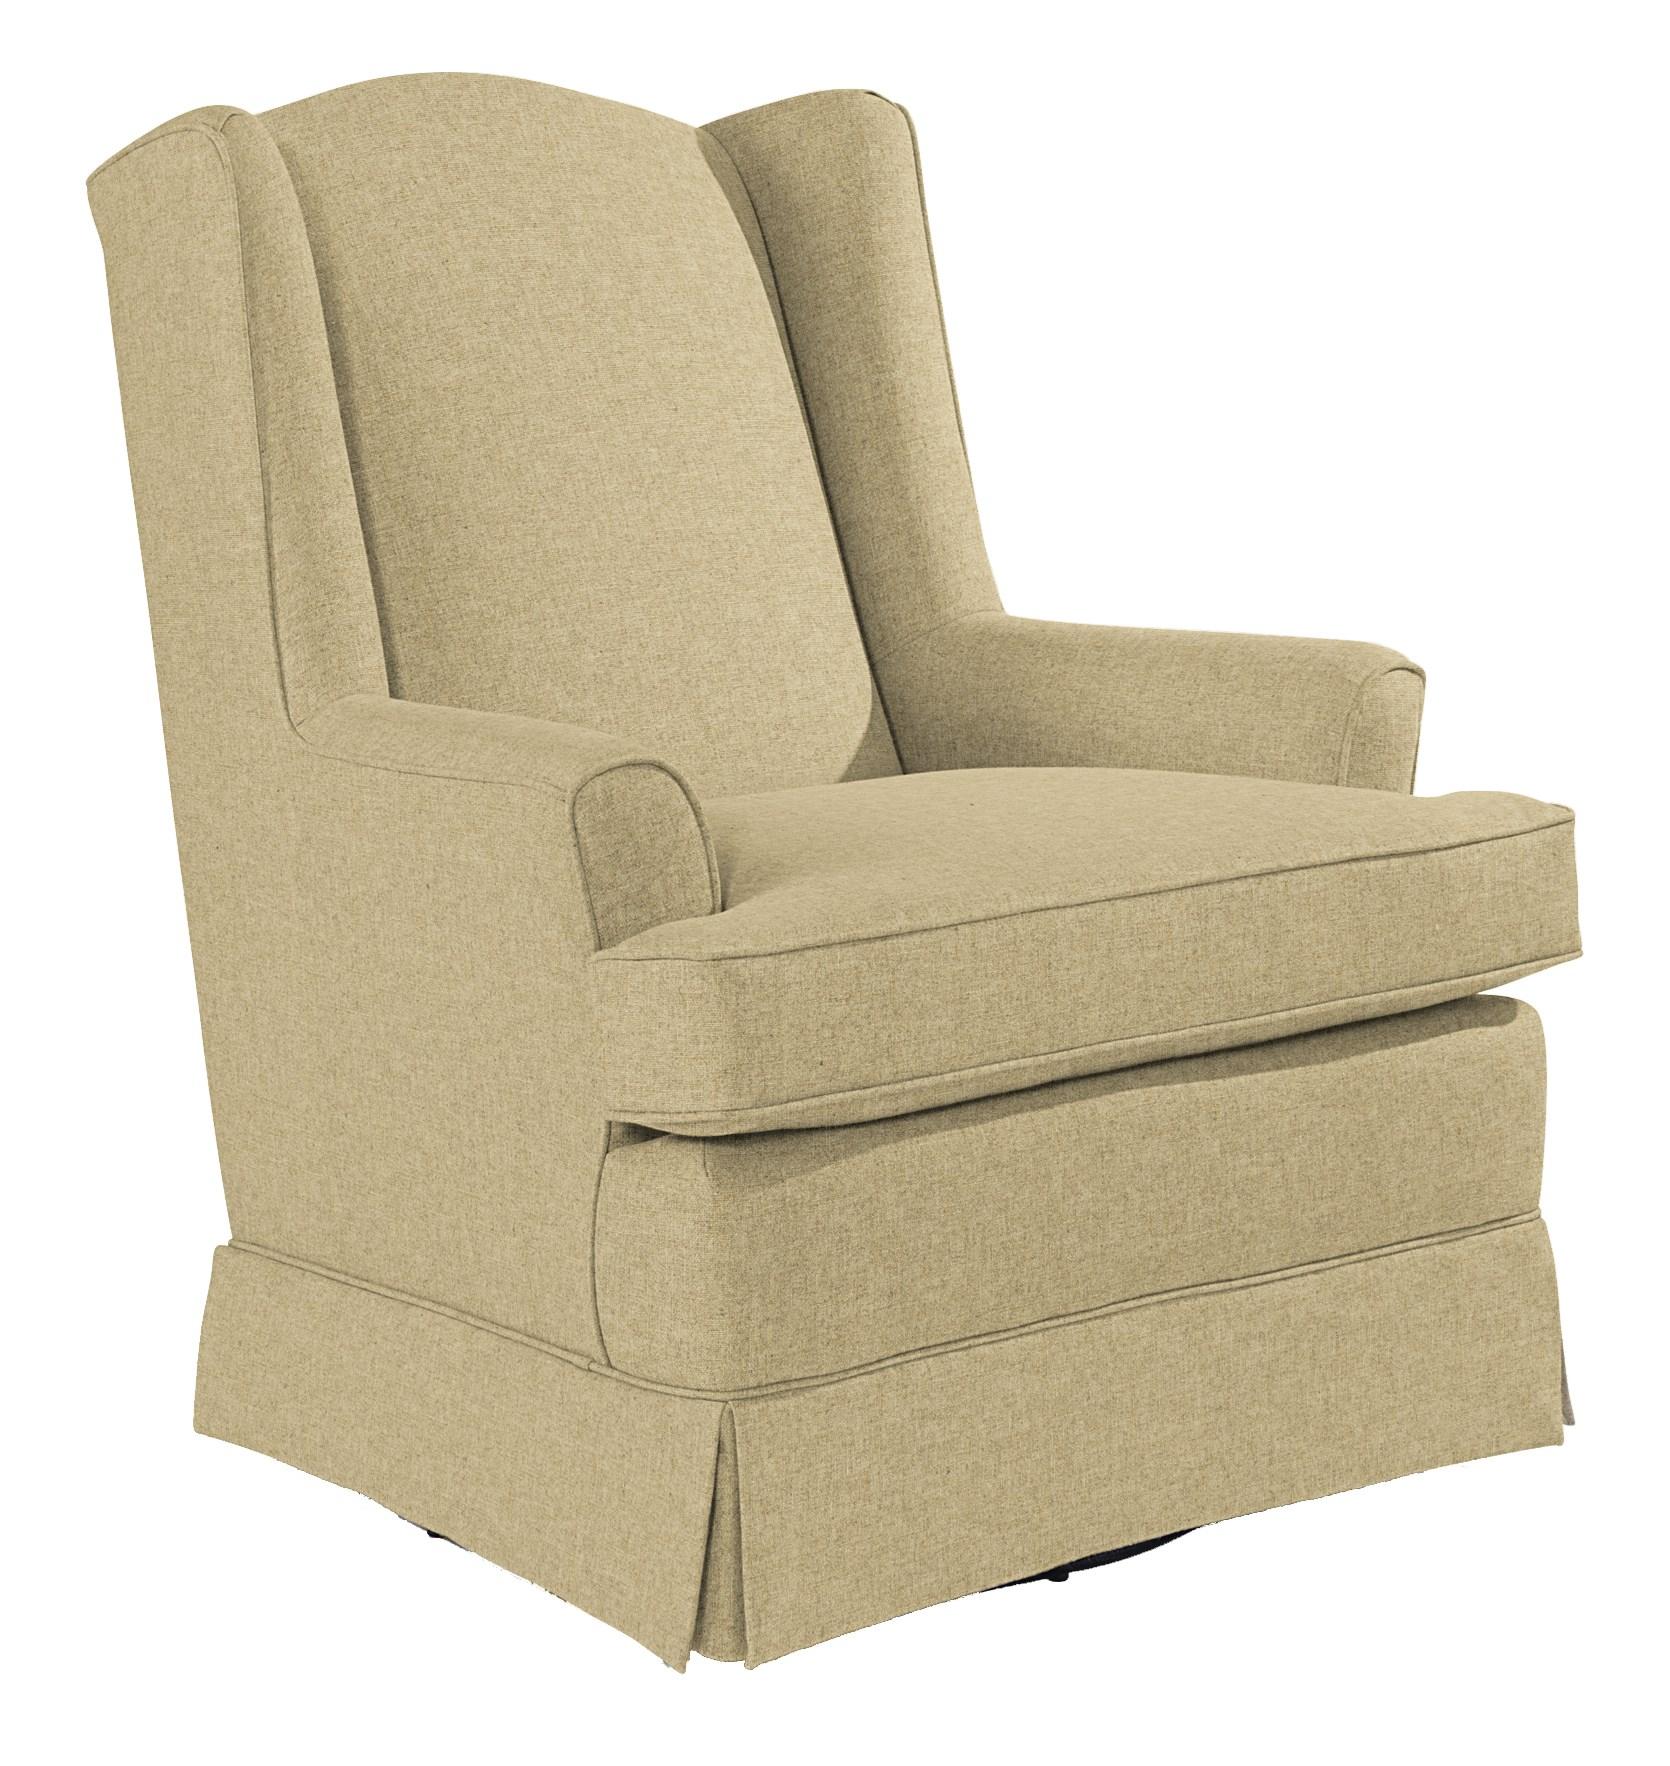 Studio 47 Swivel Glide ChairsNatasha Swivel Glider